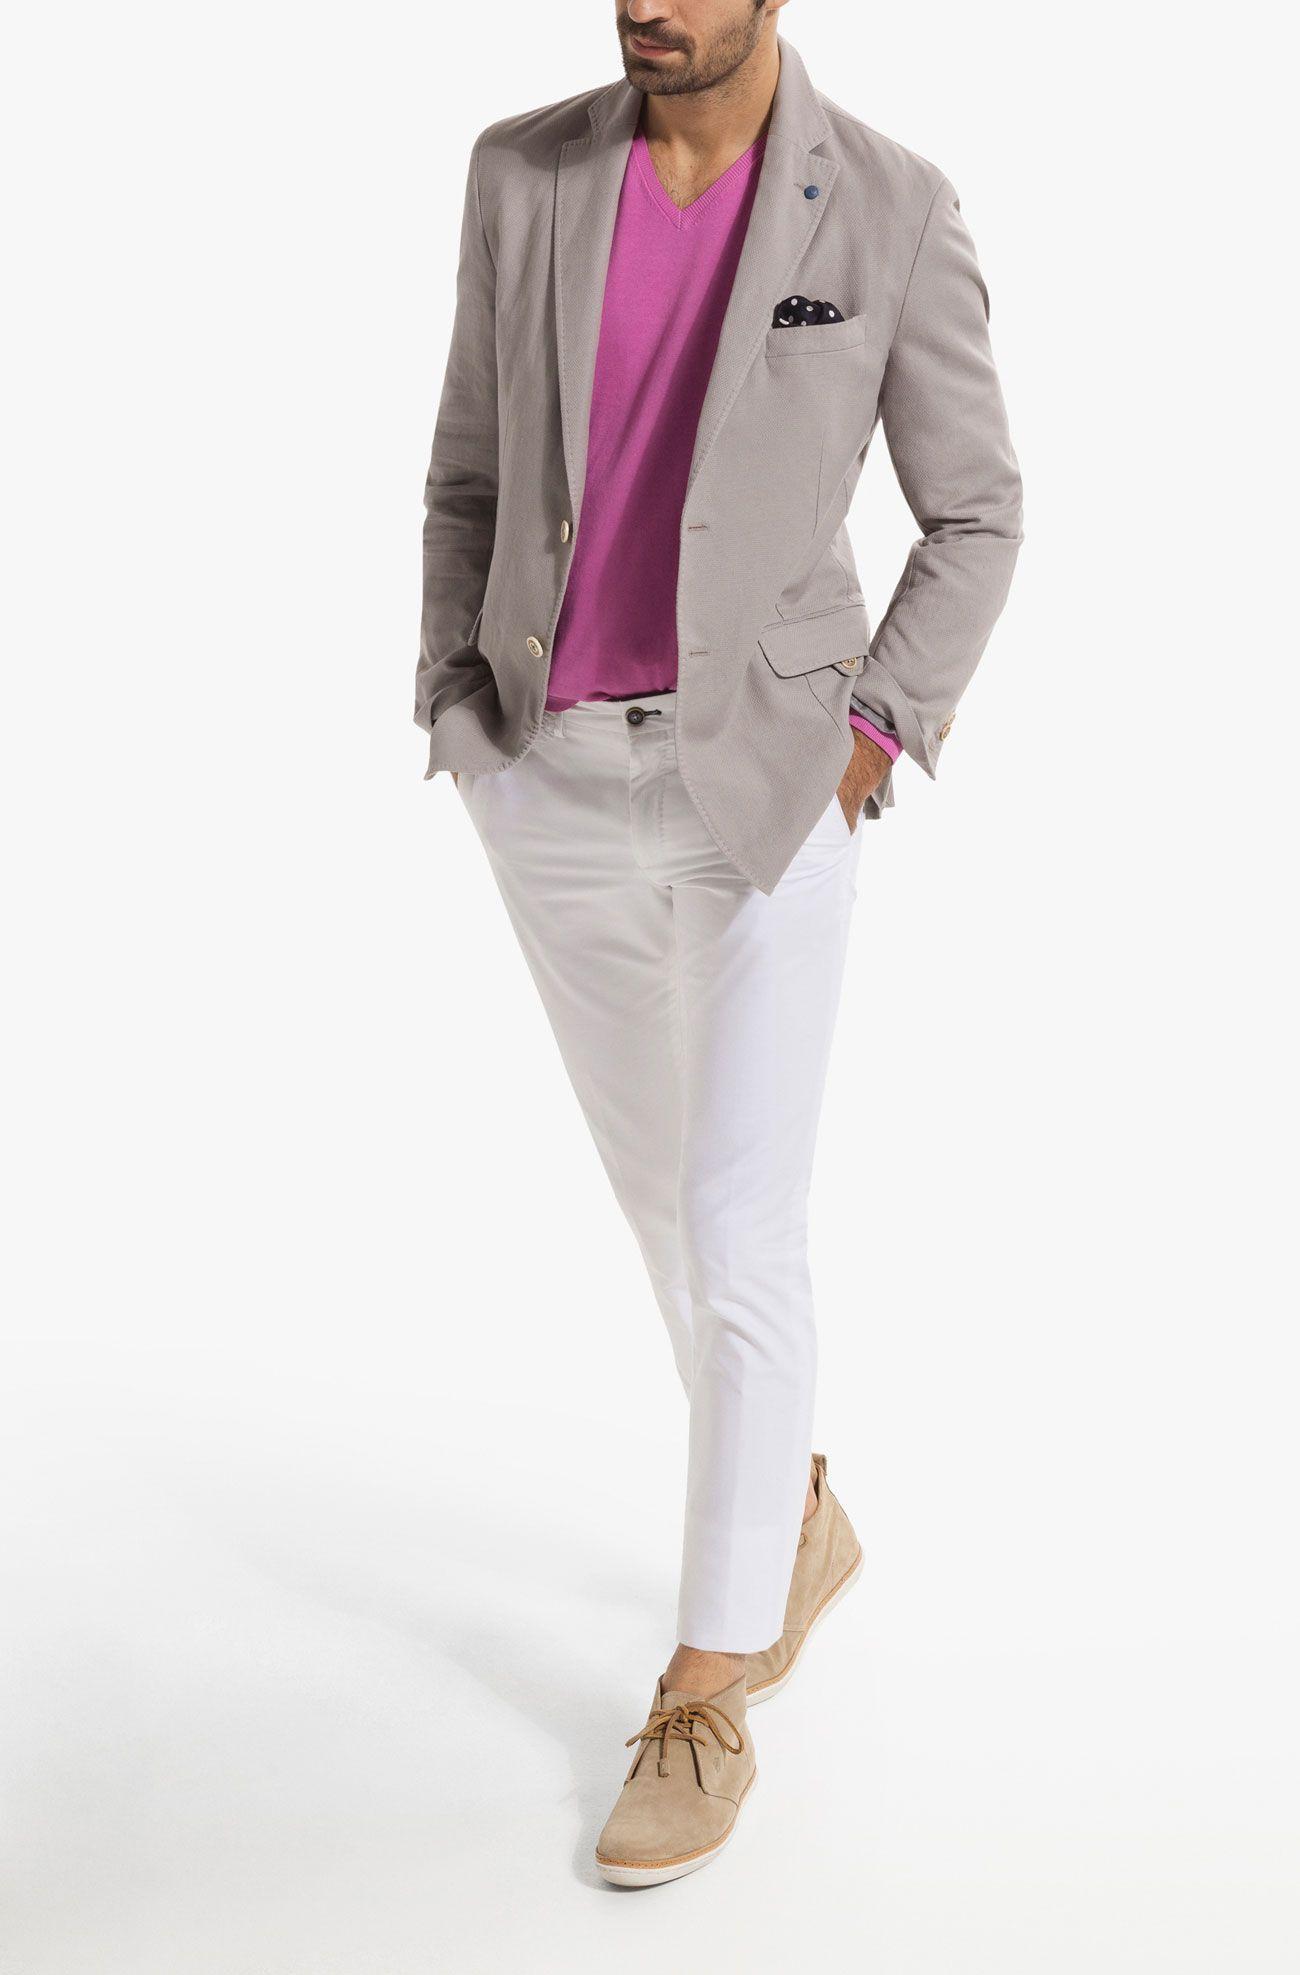 132d296affa53 tendencias-blazers-y-americanas-para-hombre-primavera-verano-2014-americana -lino-massimo-dutti